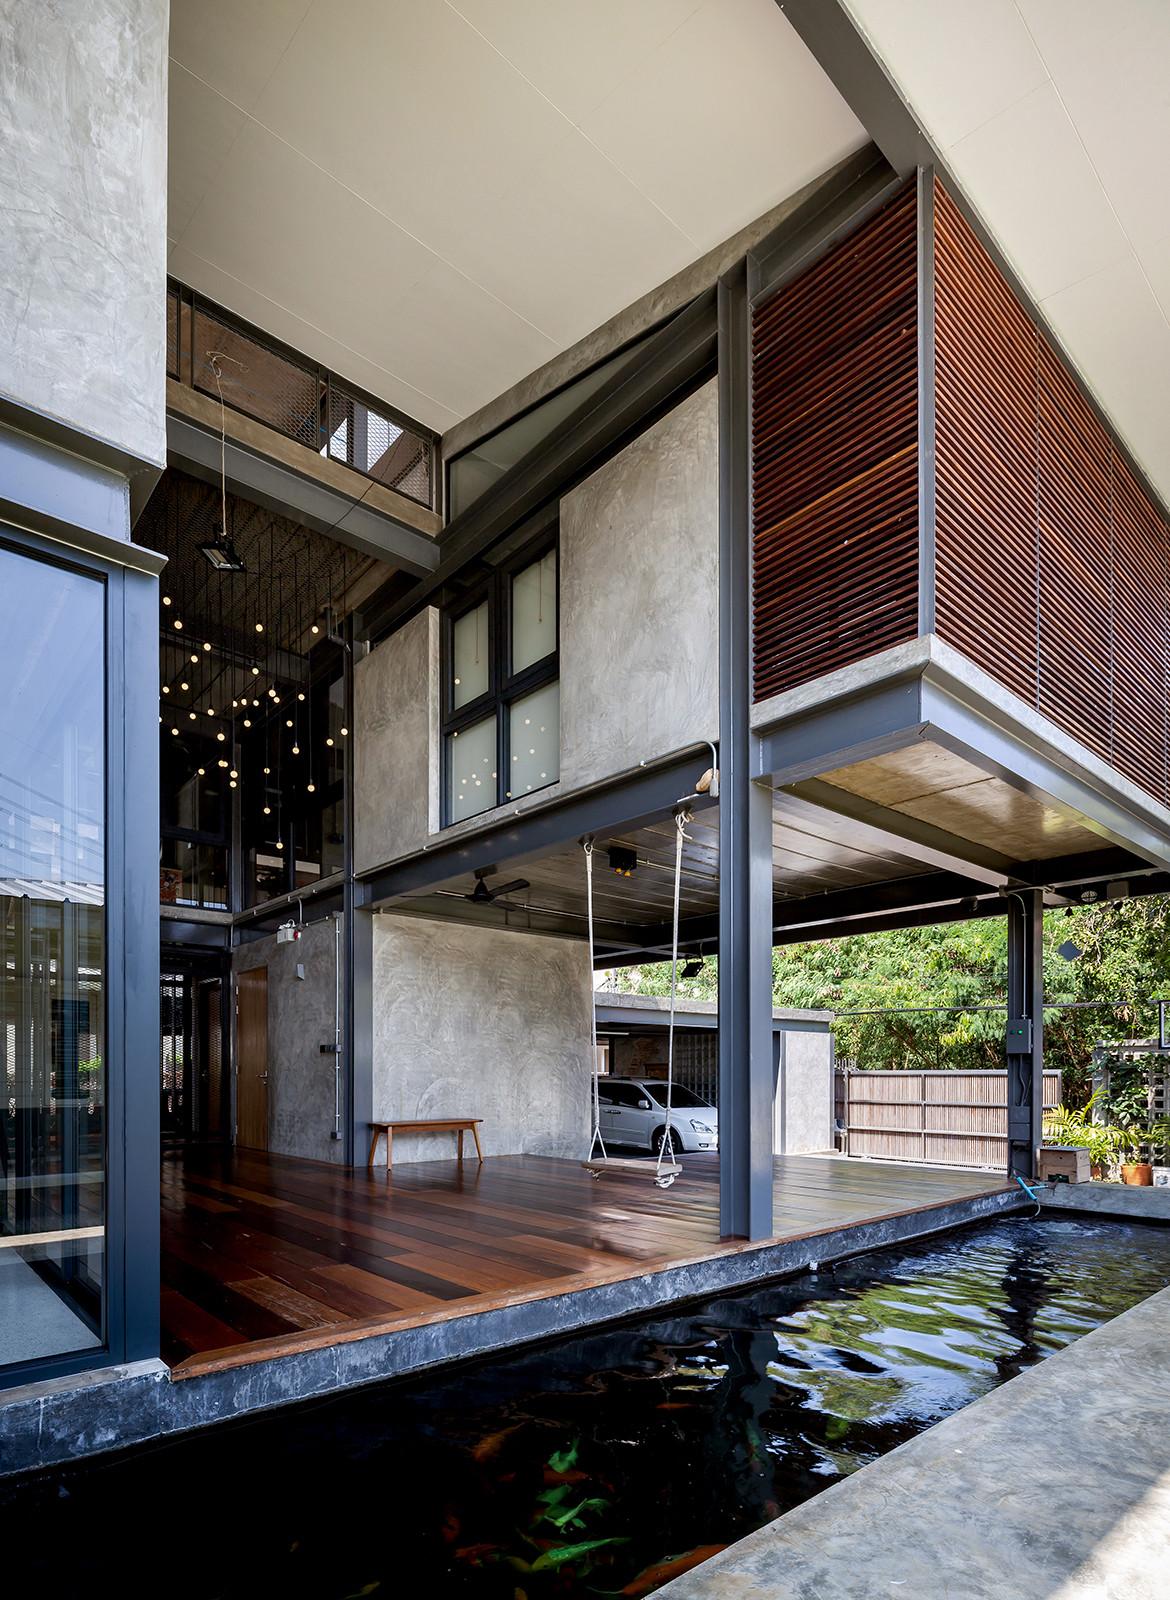 713 House Junsekino Architect and Design CC Spaceshift Studio koi pond entrance